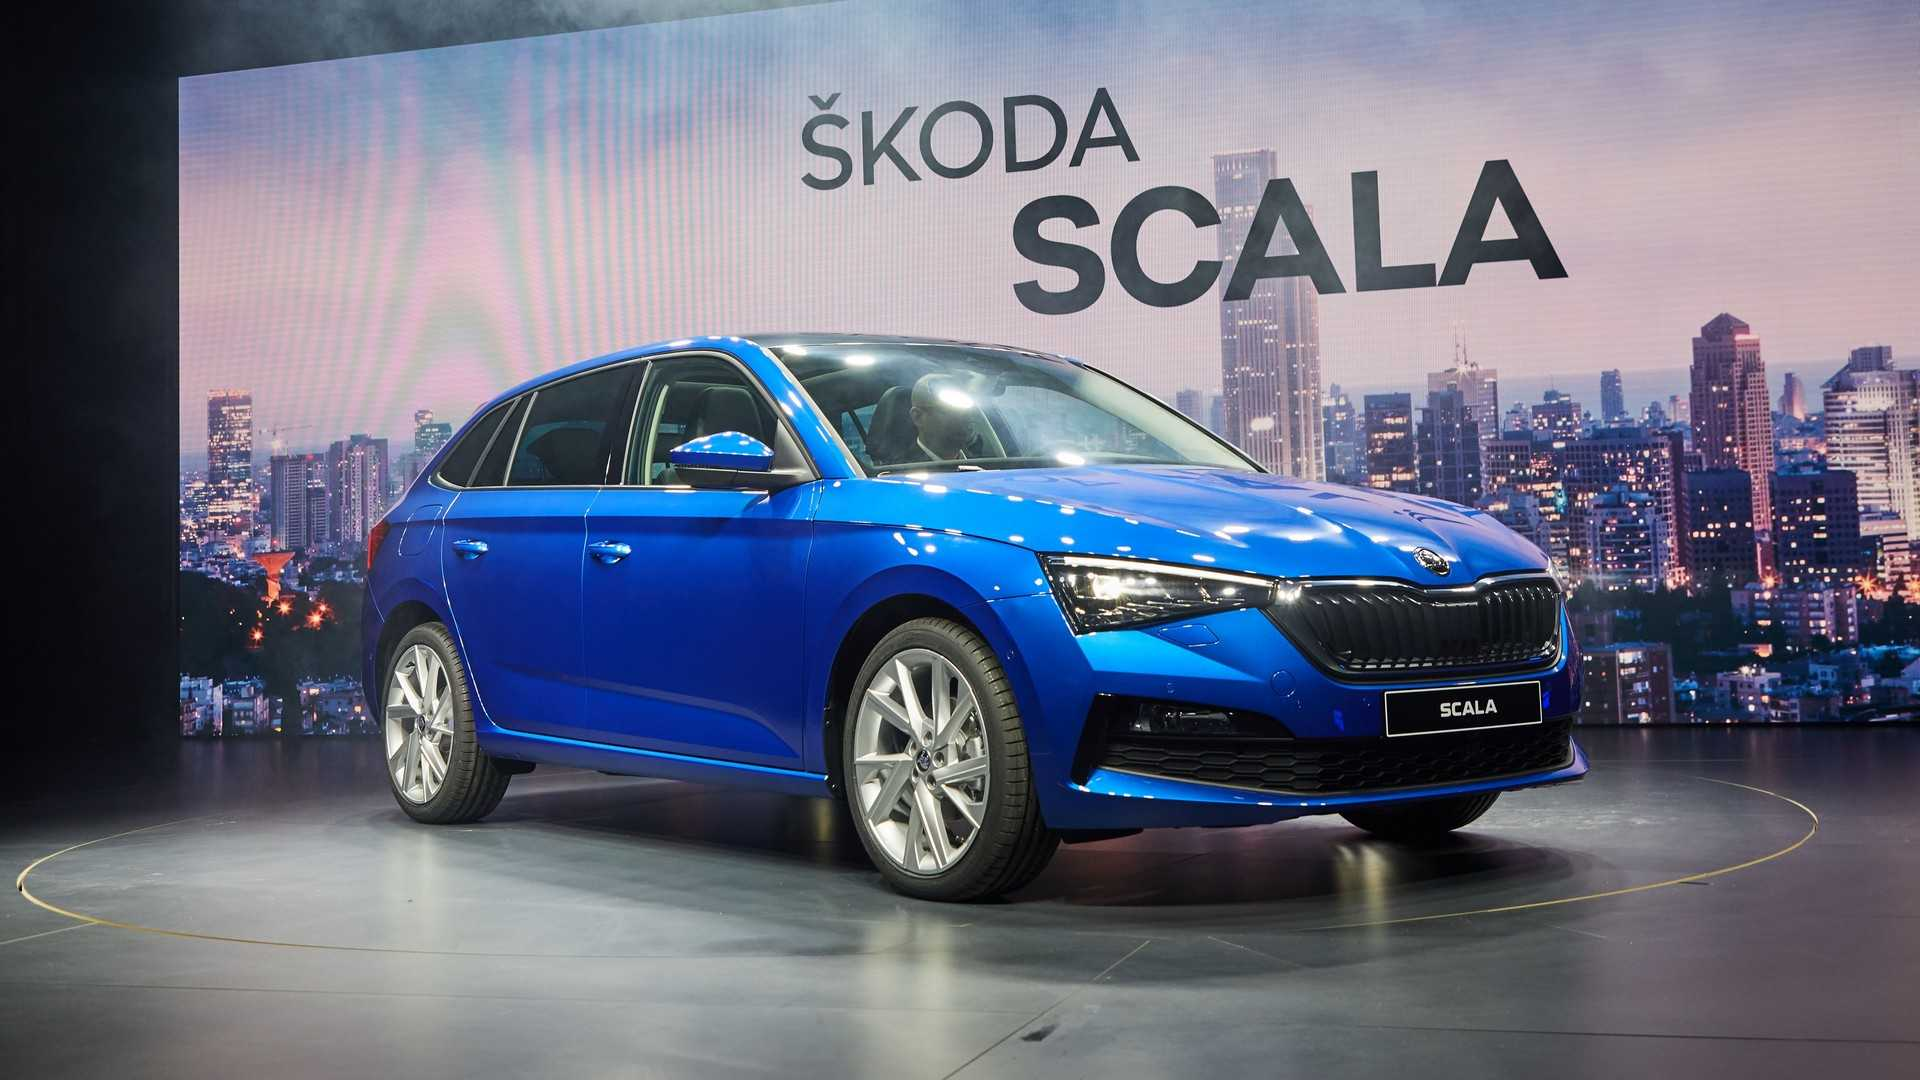 Skoda Scala: живые фото и обзор нового соперника Ford Focus и Kia Ceed